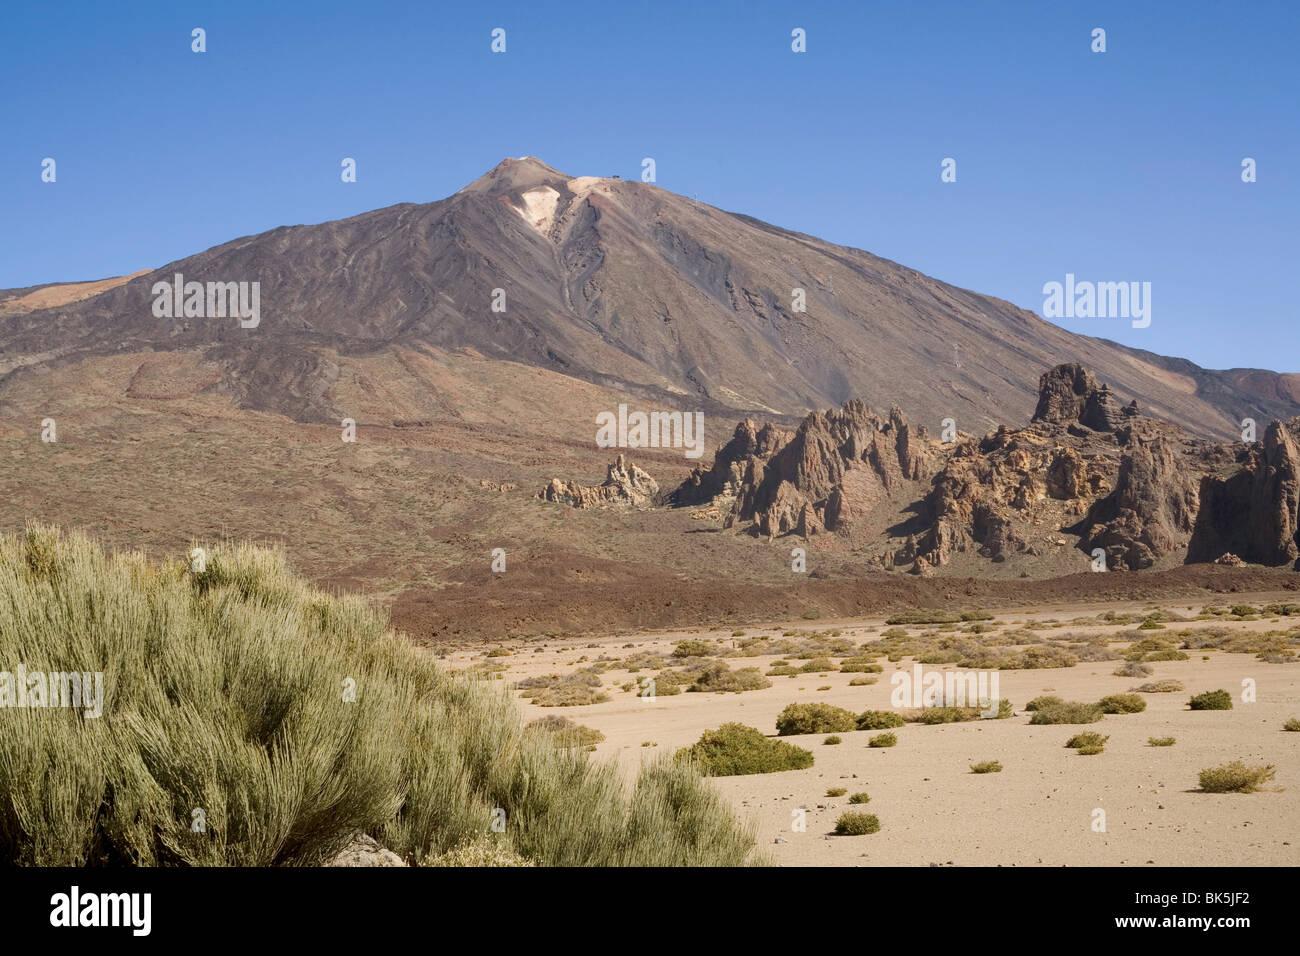 Mount Teide from Llano de Ucanca, Tenerife, Canary Islands, Spain, Europe - Stock Image